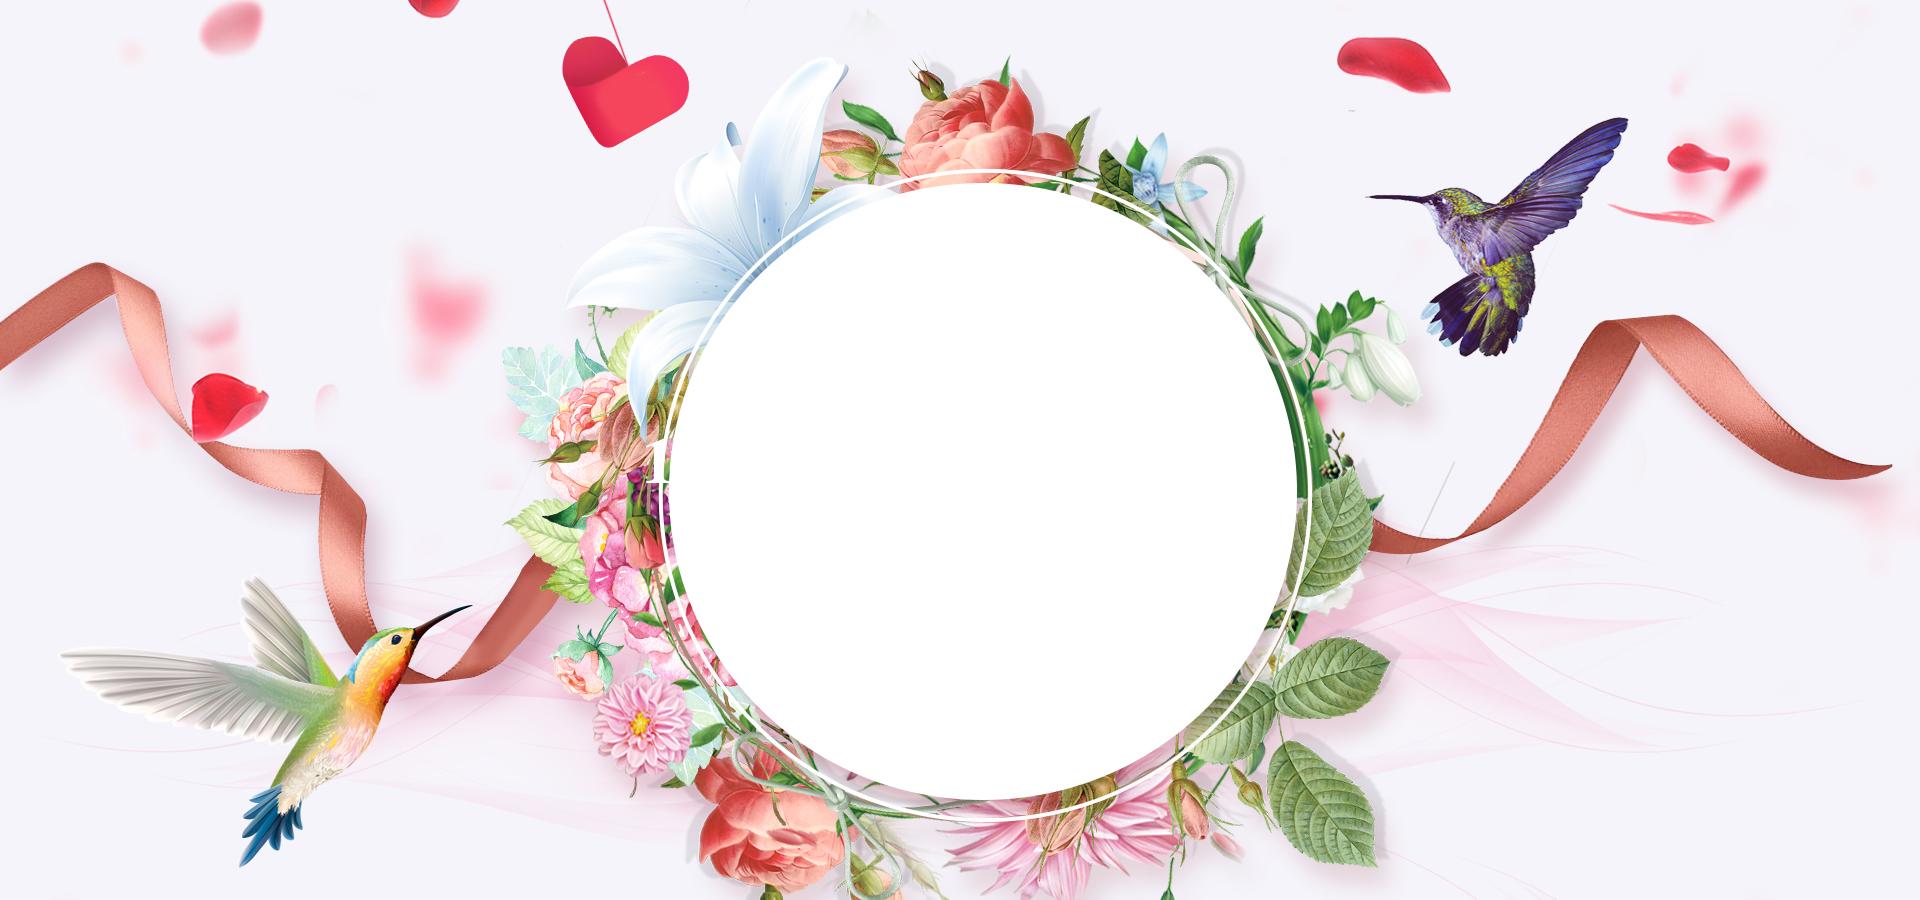 Taobao Lynx Spring Fantasy Background Design Spring